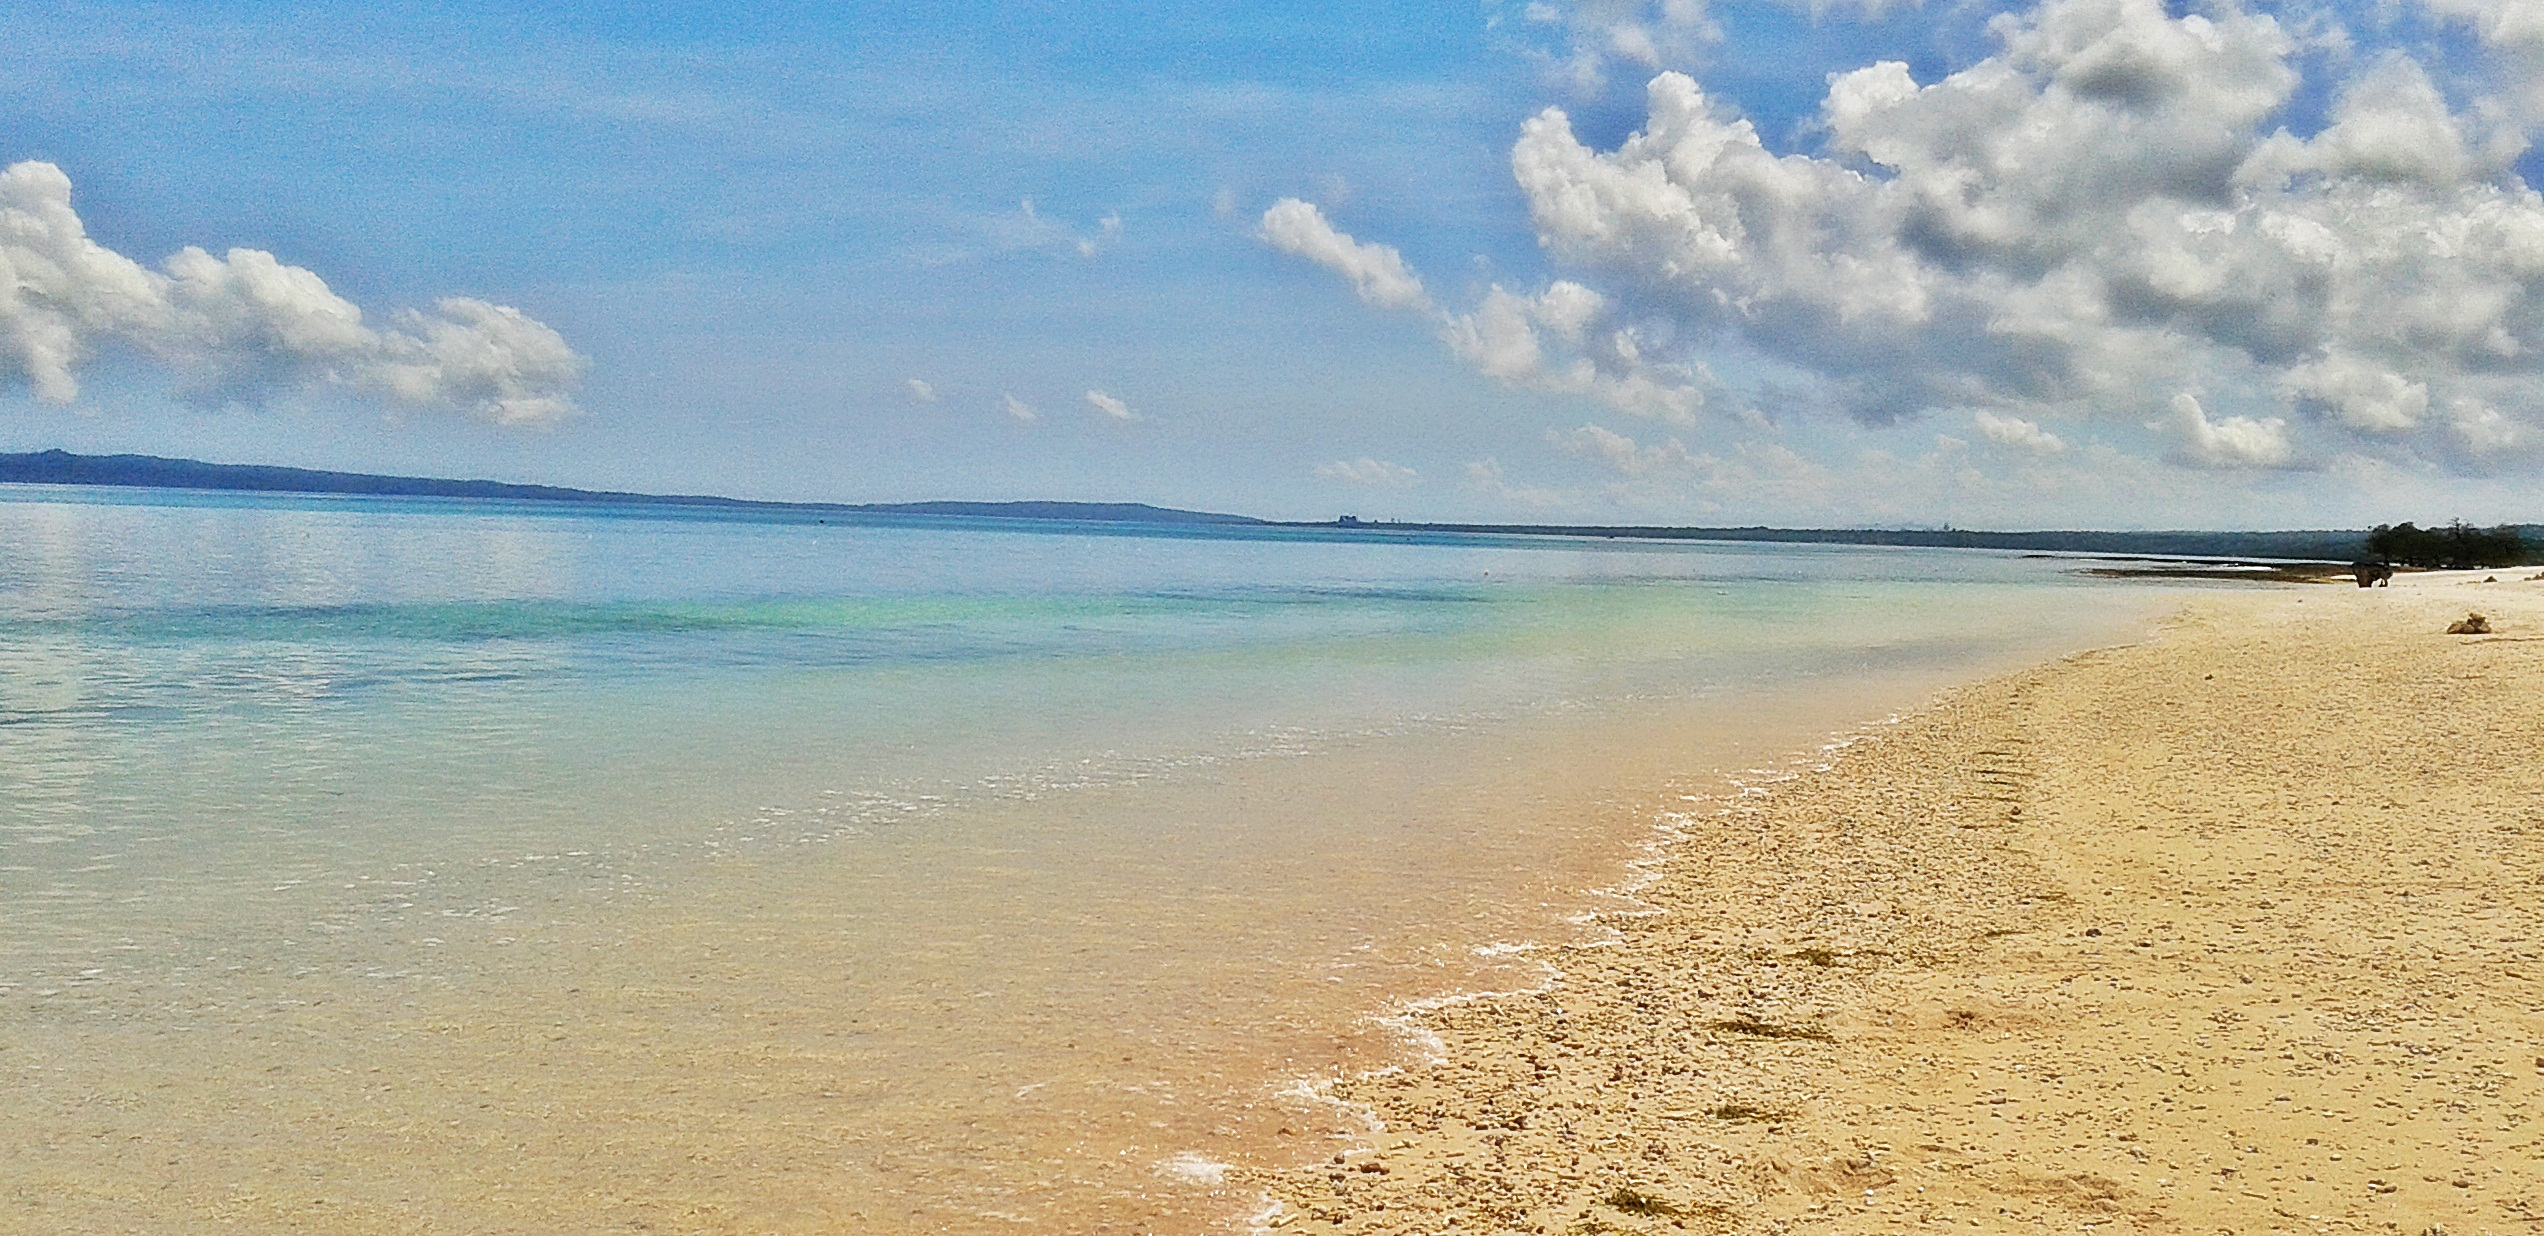 Tablolong Beach Journeyofhandoko Menu Penjelajahan Pantai Jauh Kota Kupang Lasiana